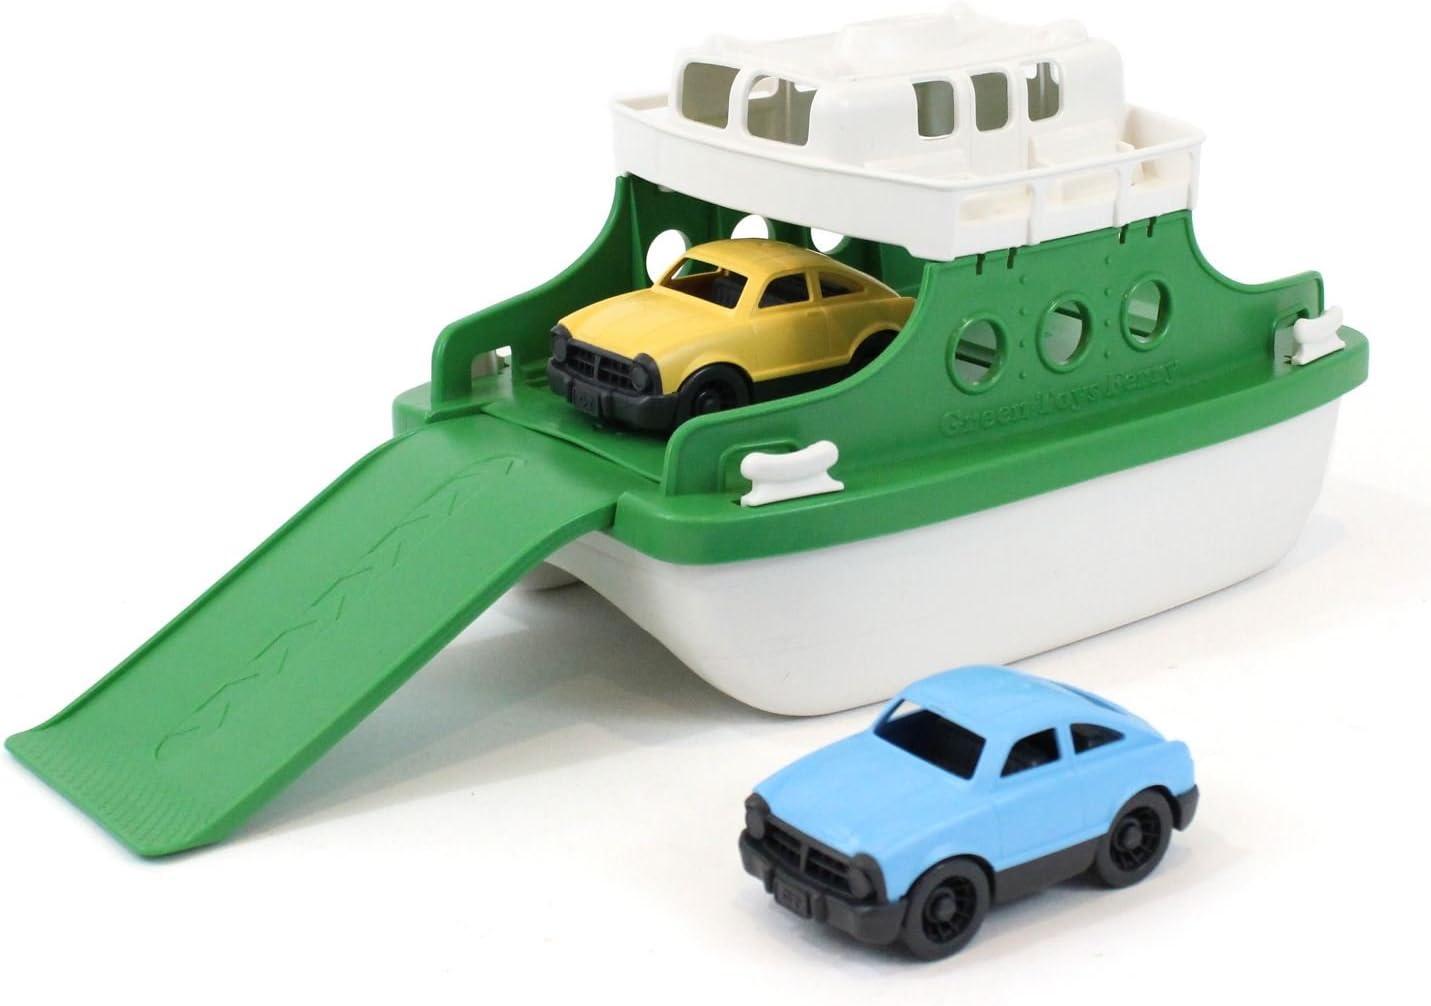 "Green Toys Ferry Boat Bathtub Toy, Green/White, 10""X 6.6""x 6.3"""